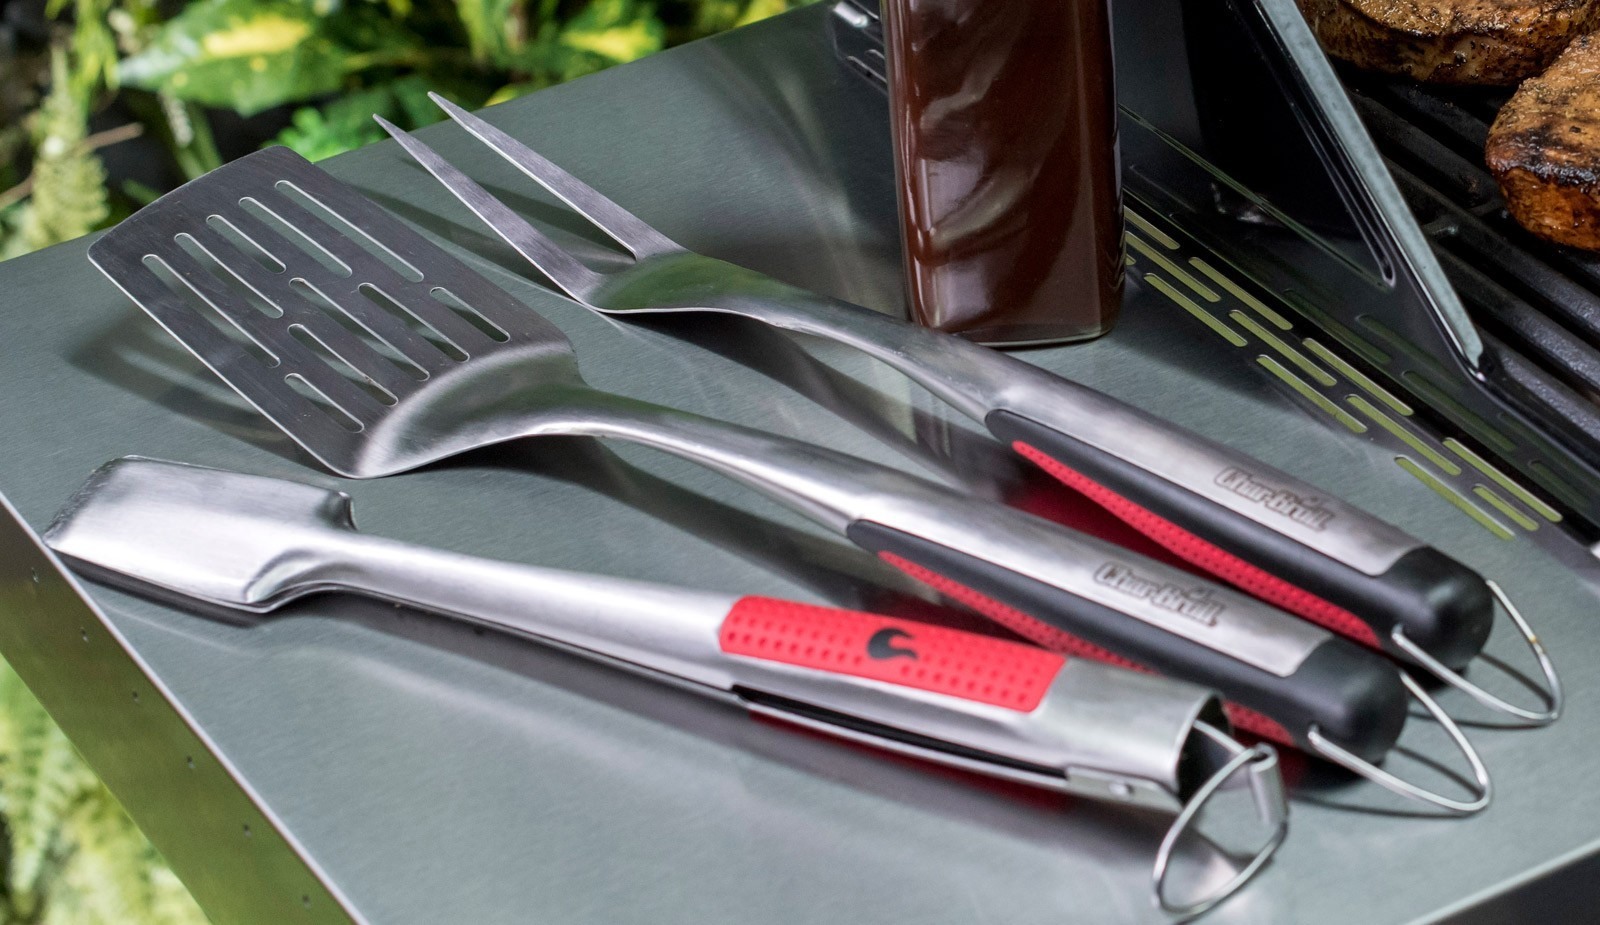 Char-Broil Grillbesteck 7709 Premium 3-teilig Bild 1